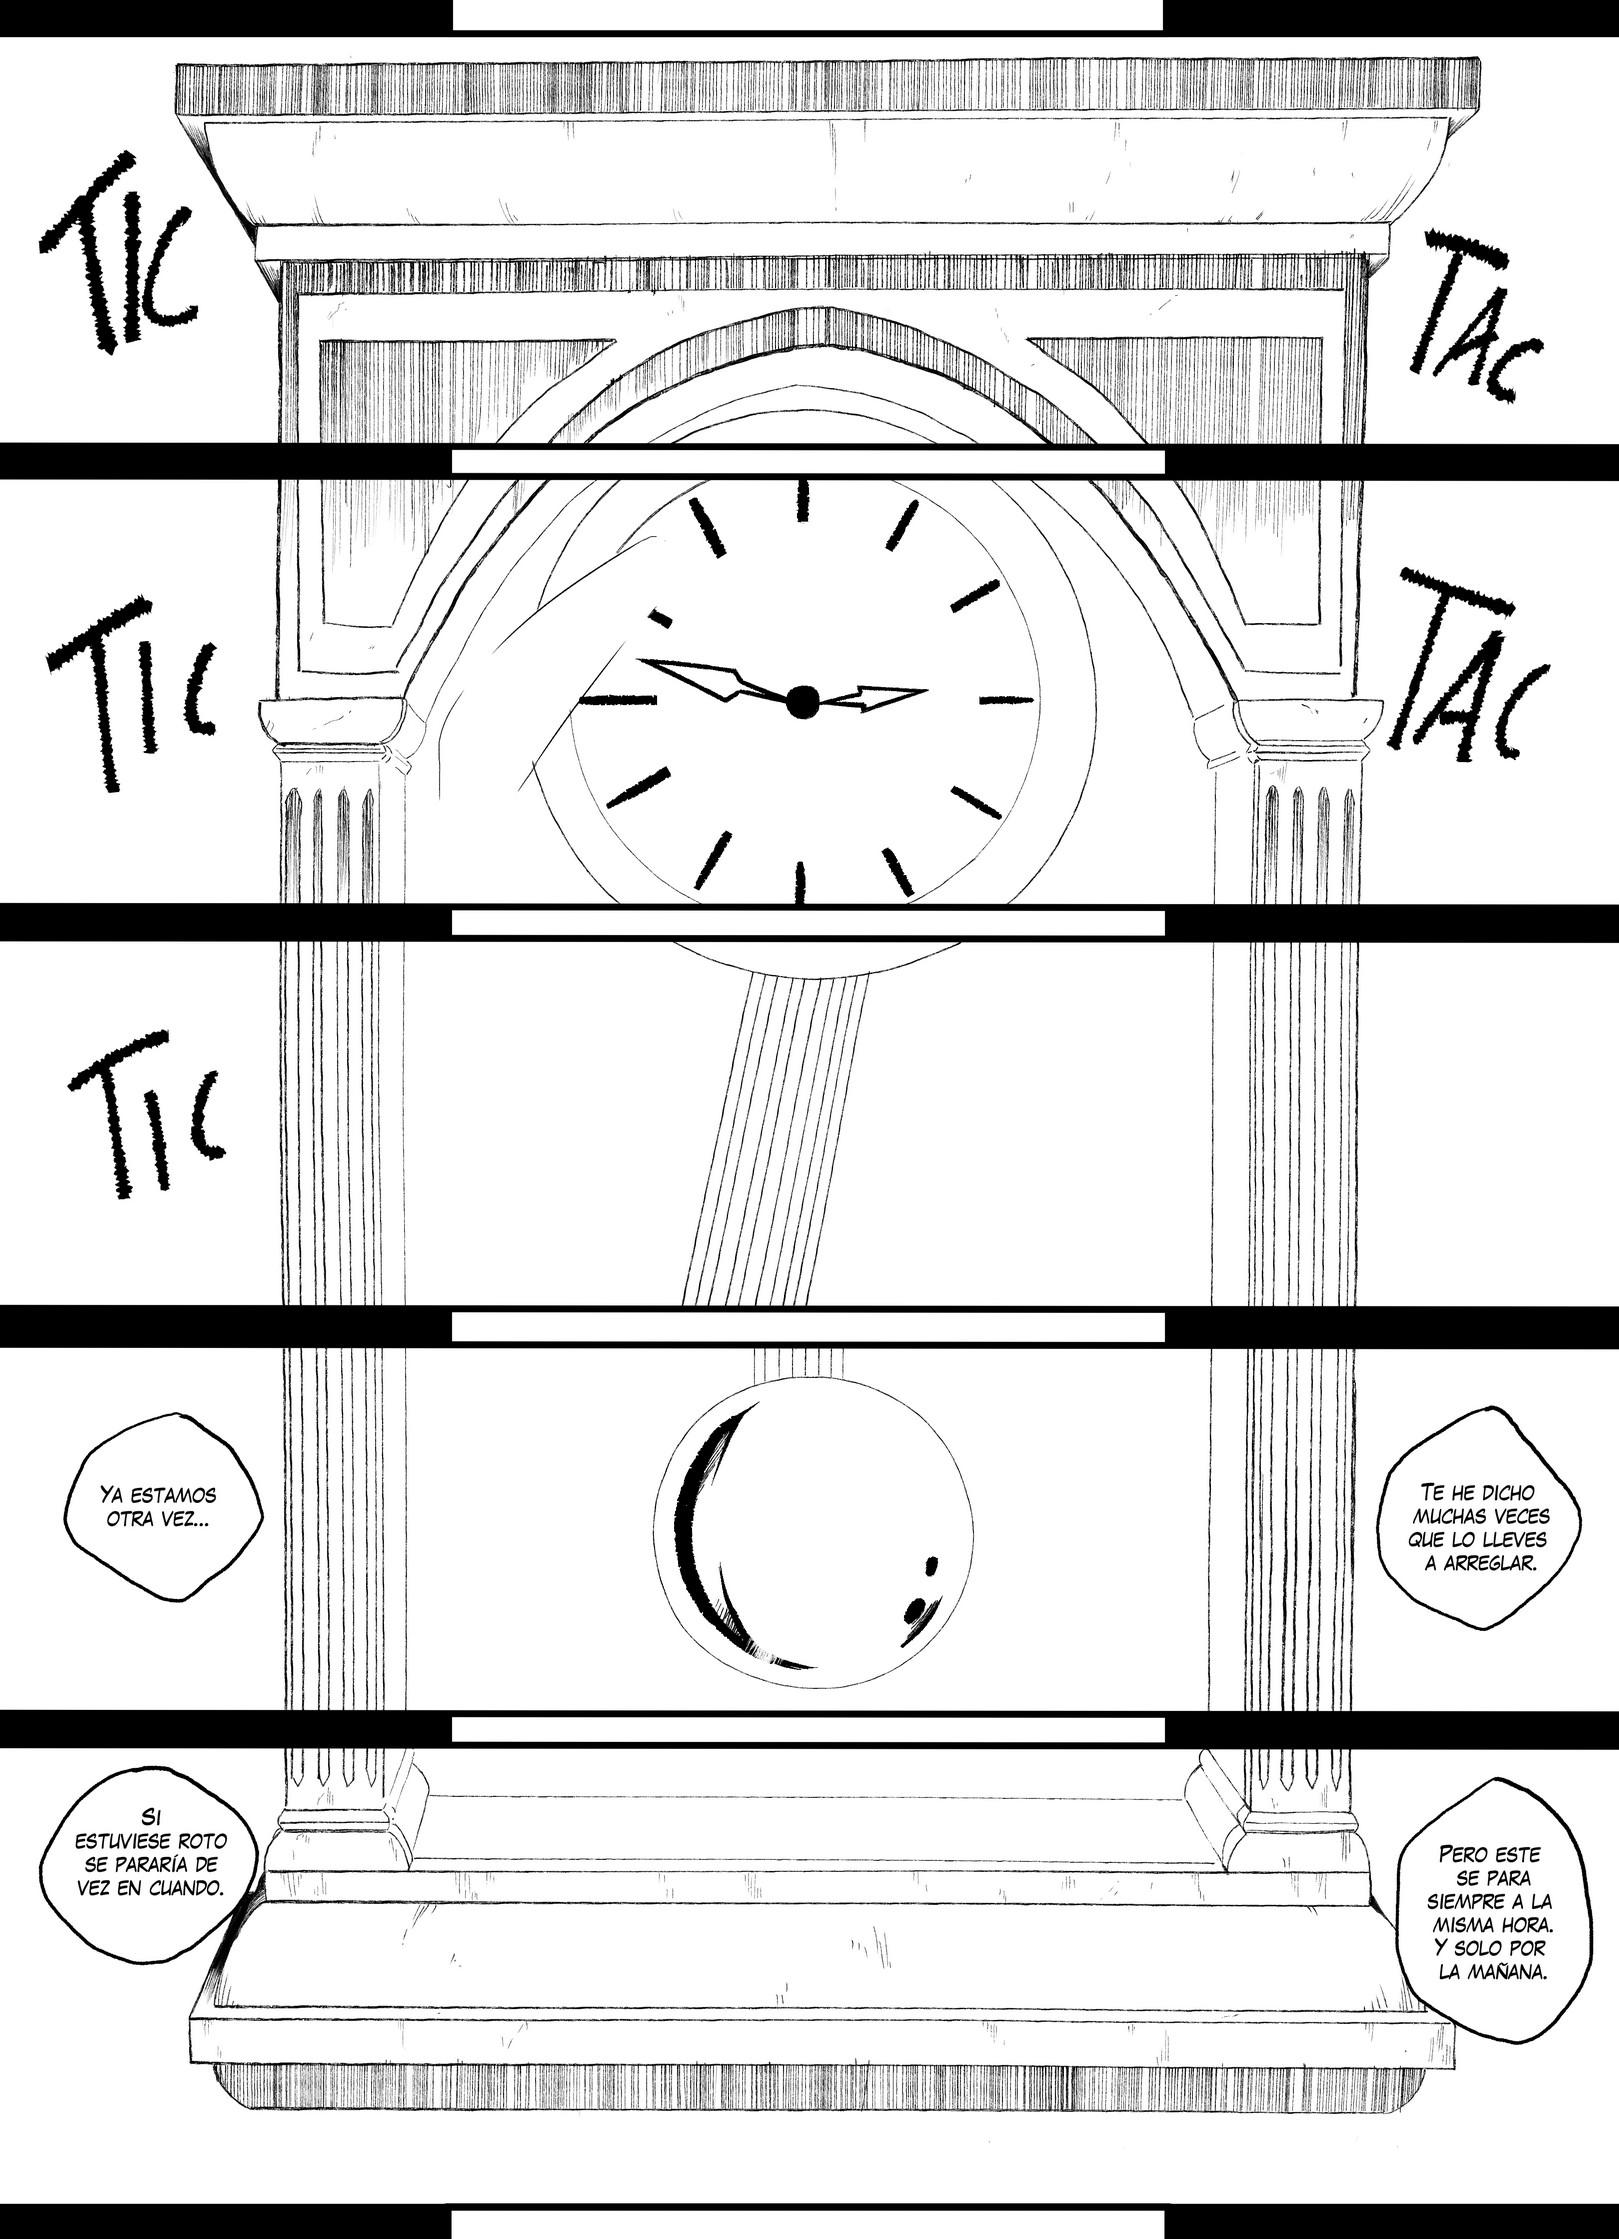 Reloj_Alejandro_García_Mangana_pagina00001